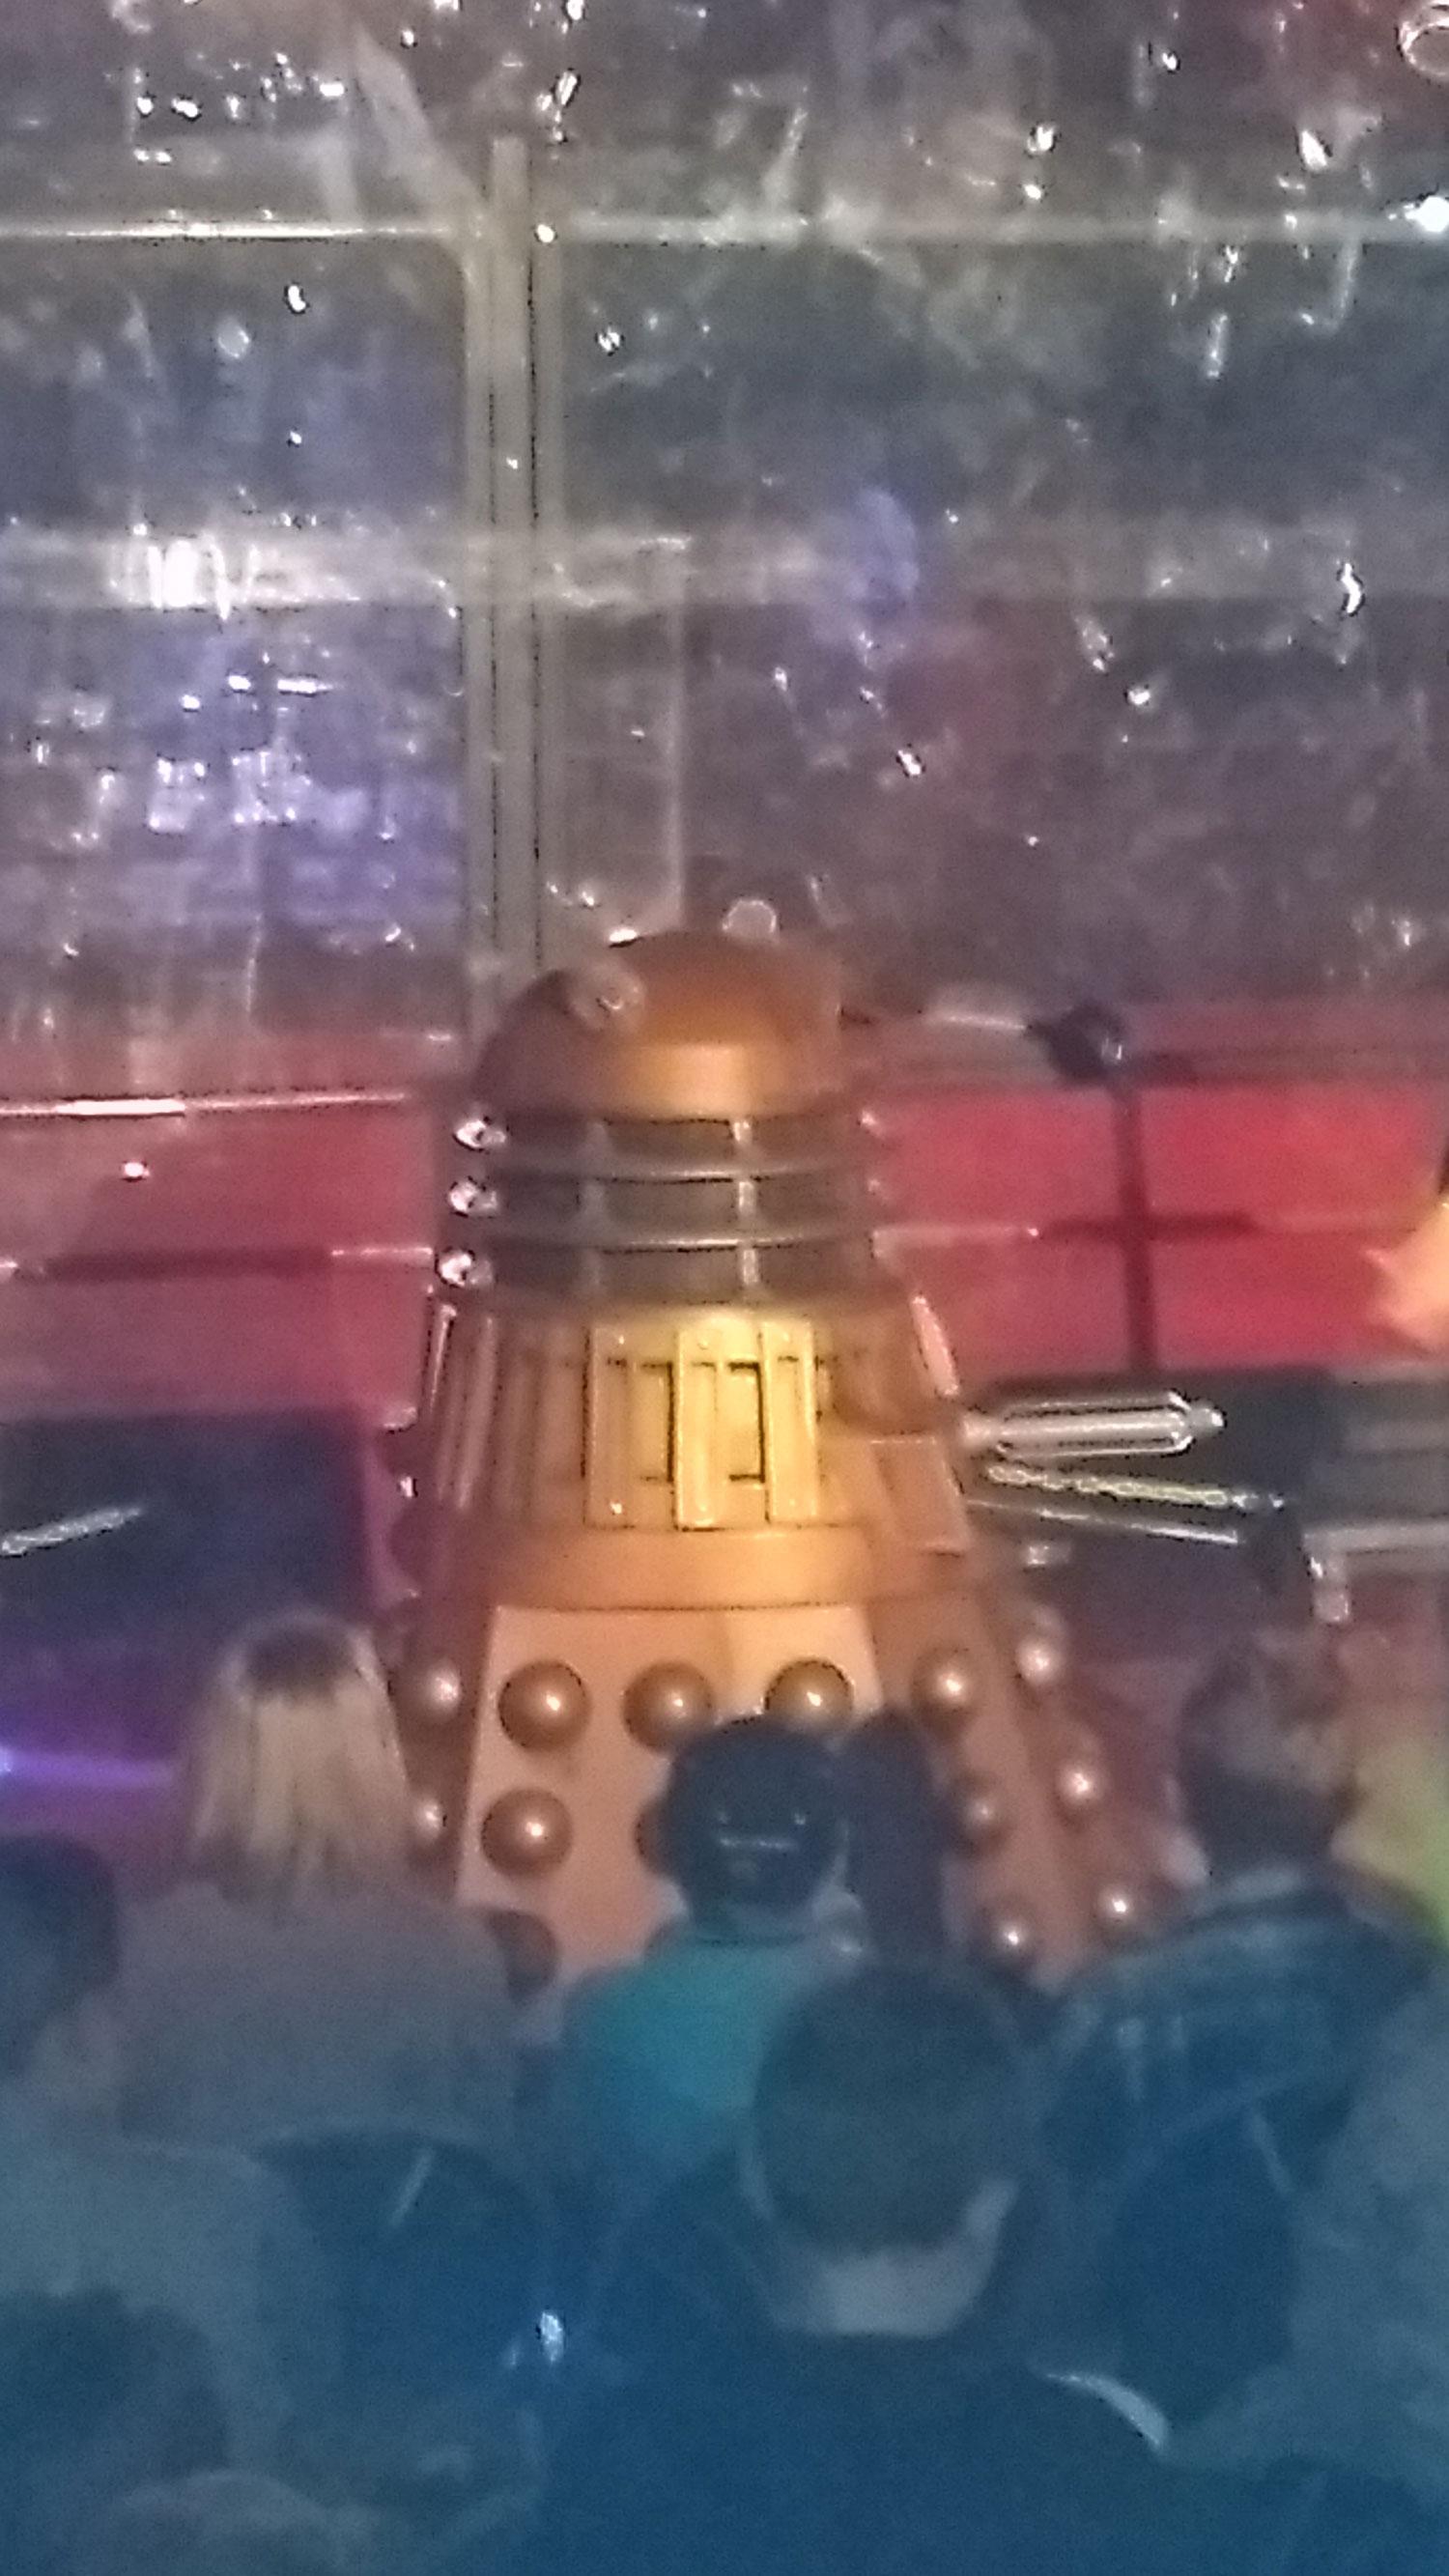 Doctor Who Dalek!